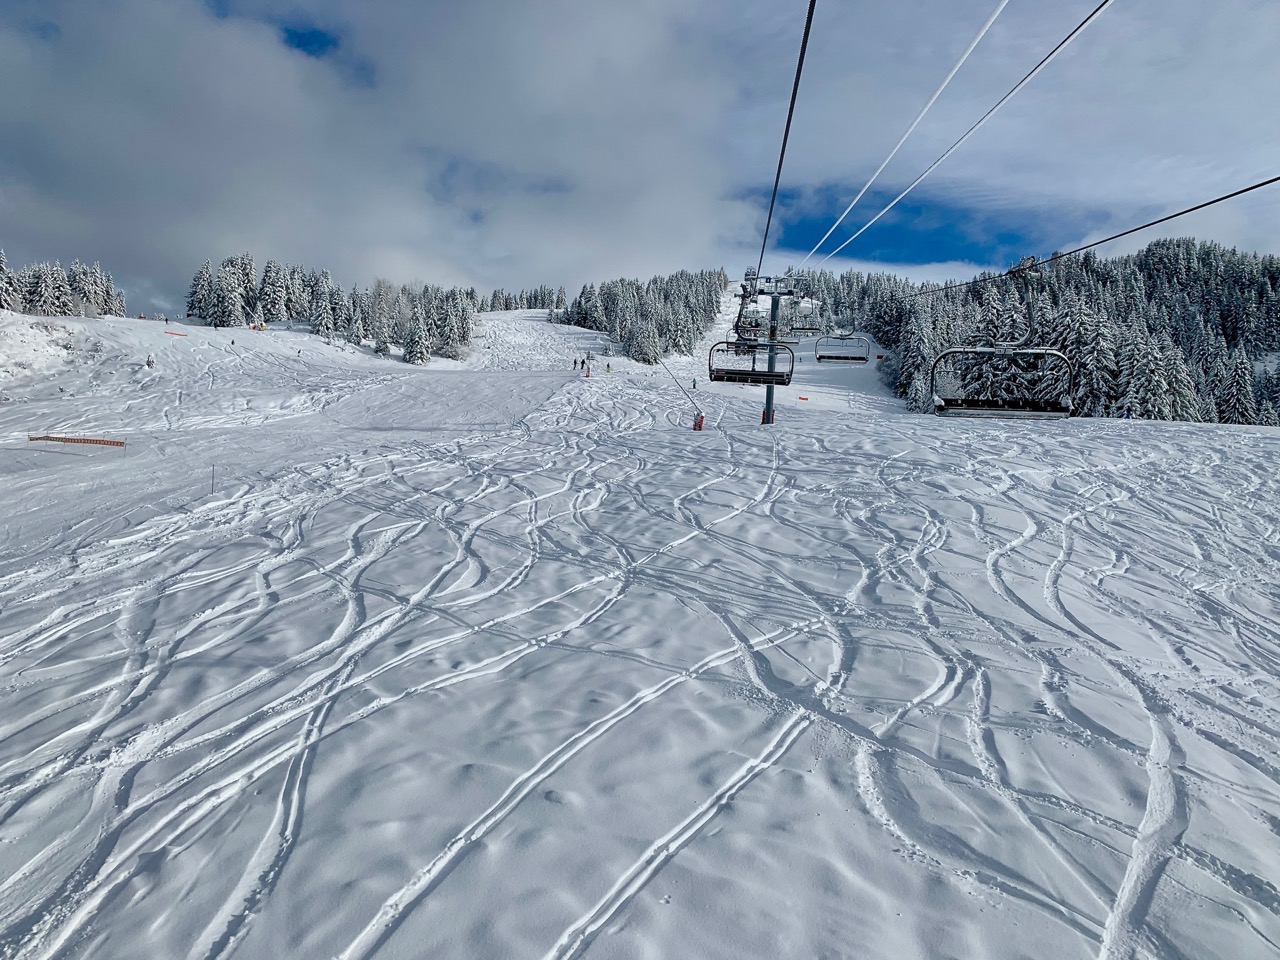 2019 01 20 skiing 04 1280